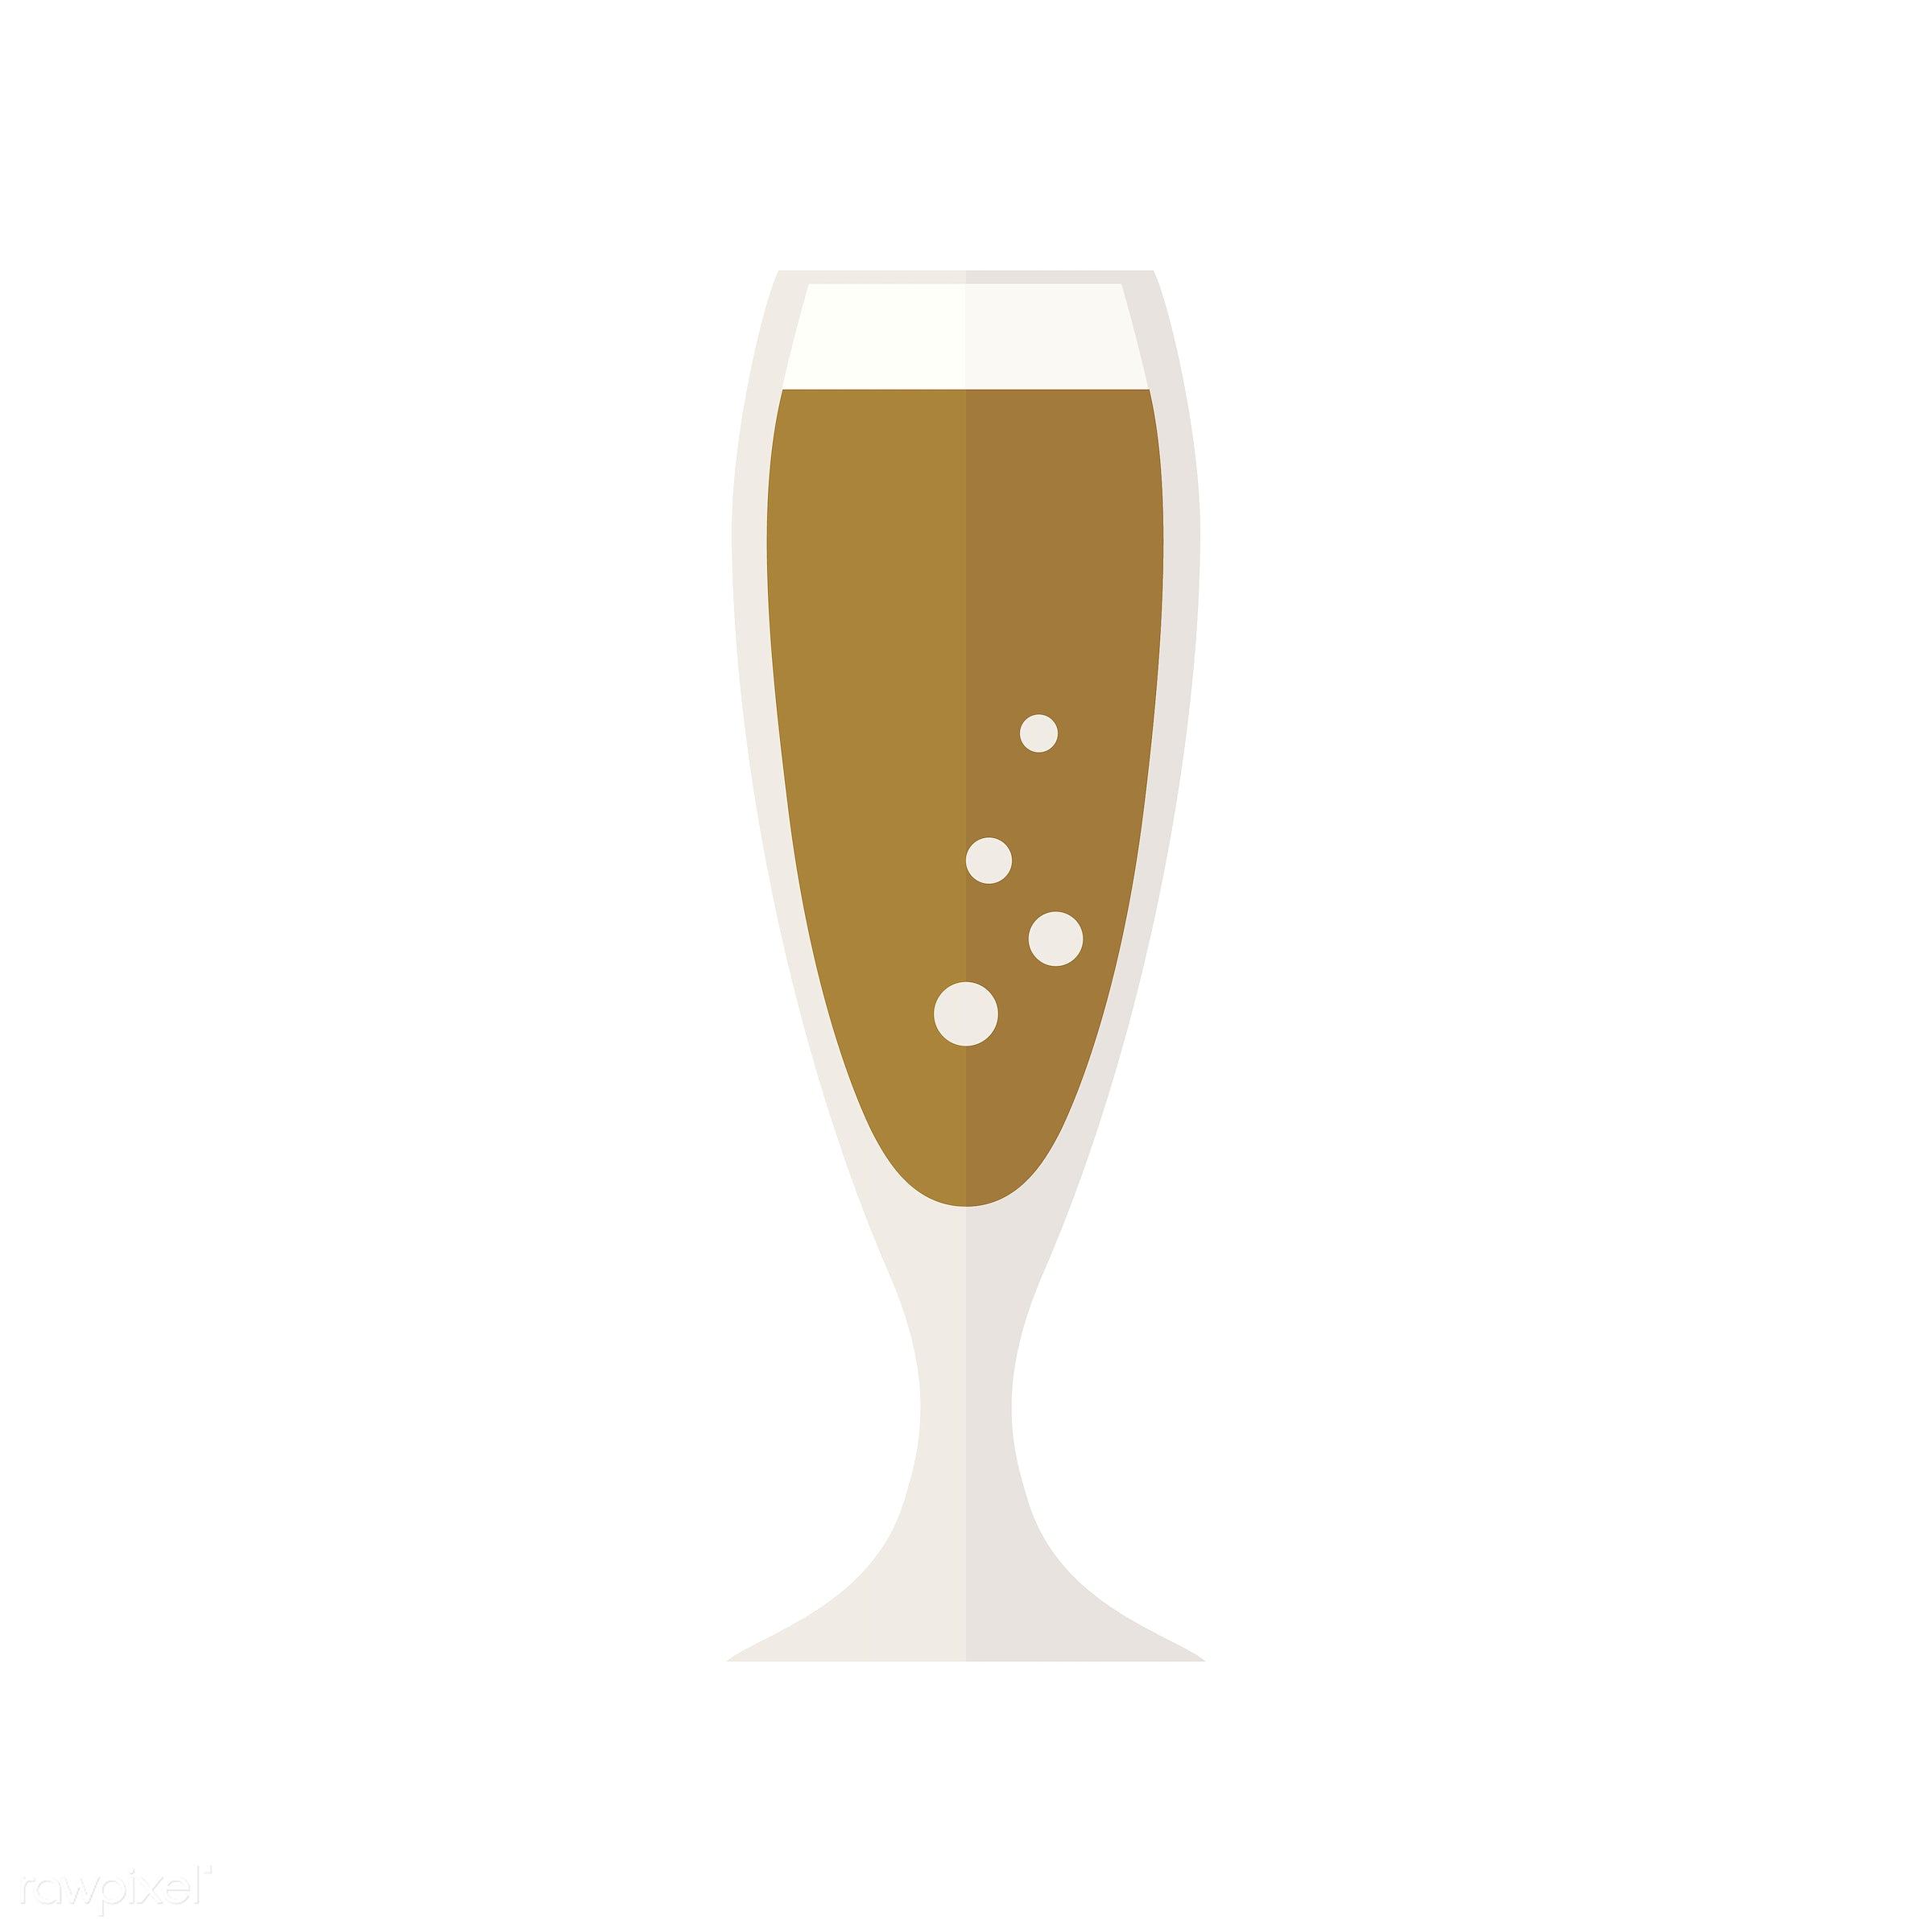 vector, graphic, illustration, icon, symbol, colorful, cute, drink, beverage, water, sparkling wine, wine, soda